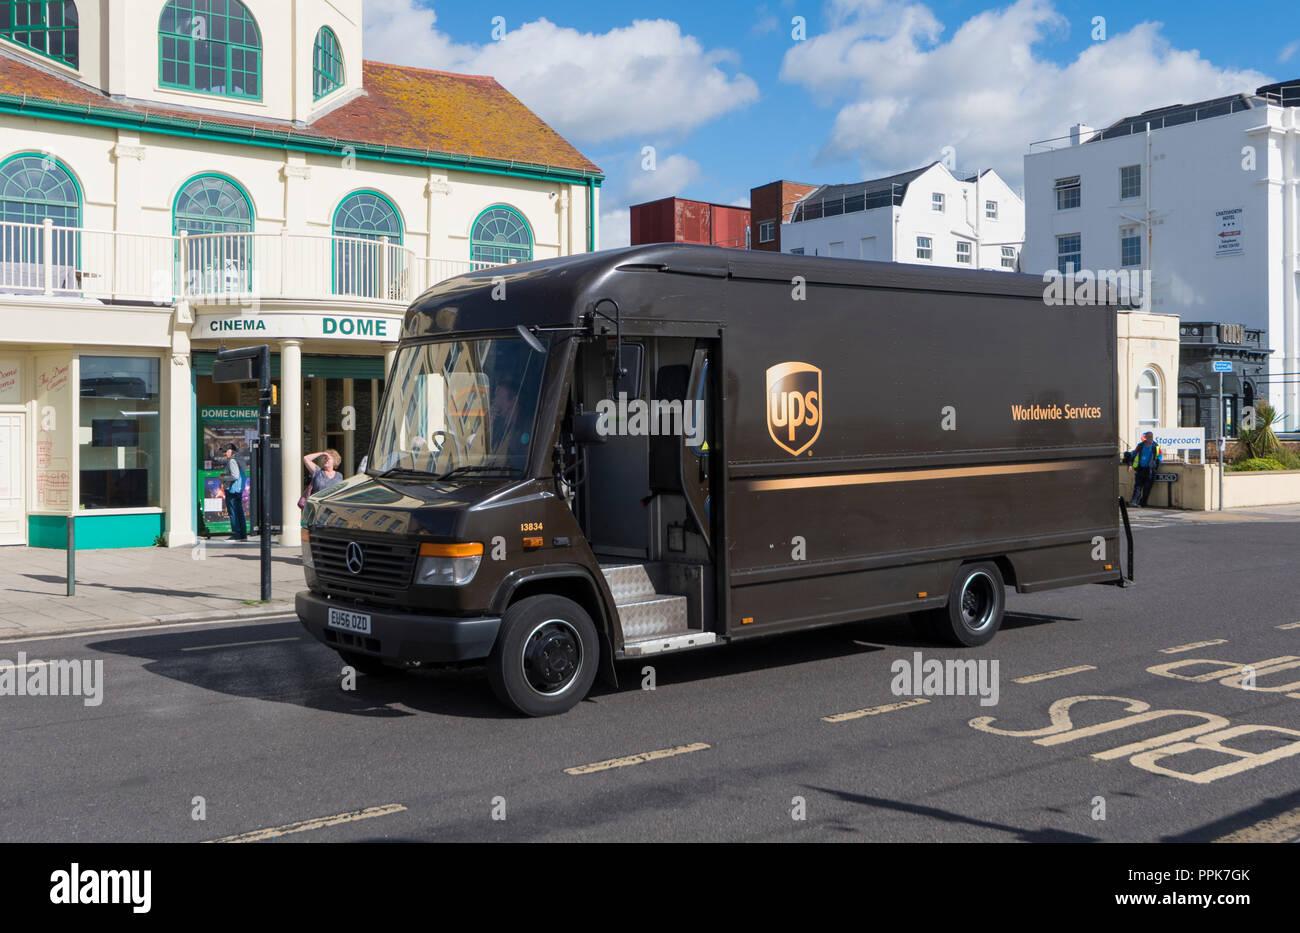 Braun UPS Worldwide Services Parcel Delivery van in West Sussex, England, UK. Stockbild